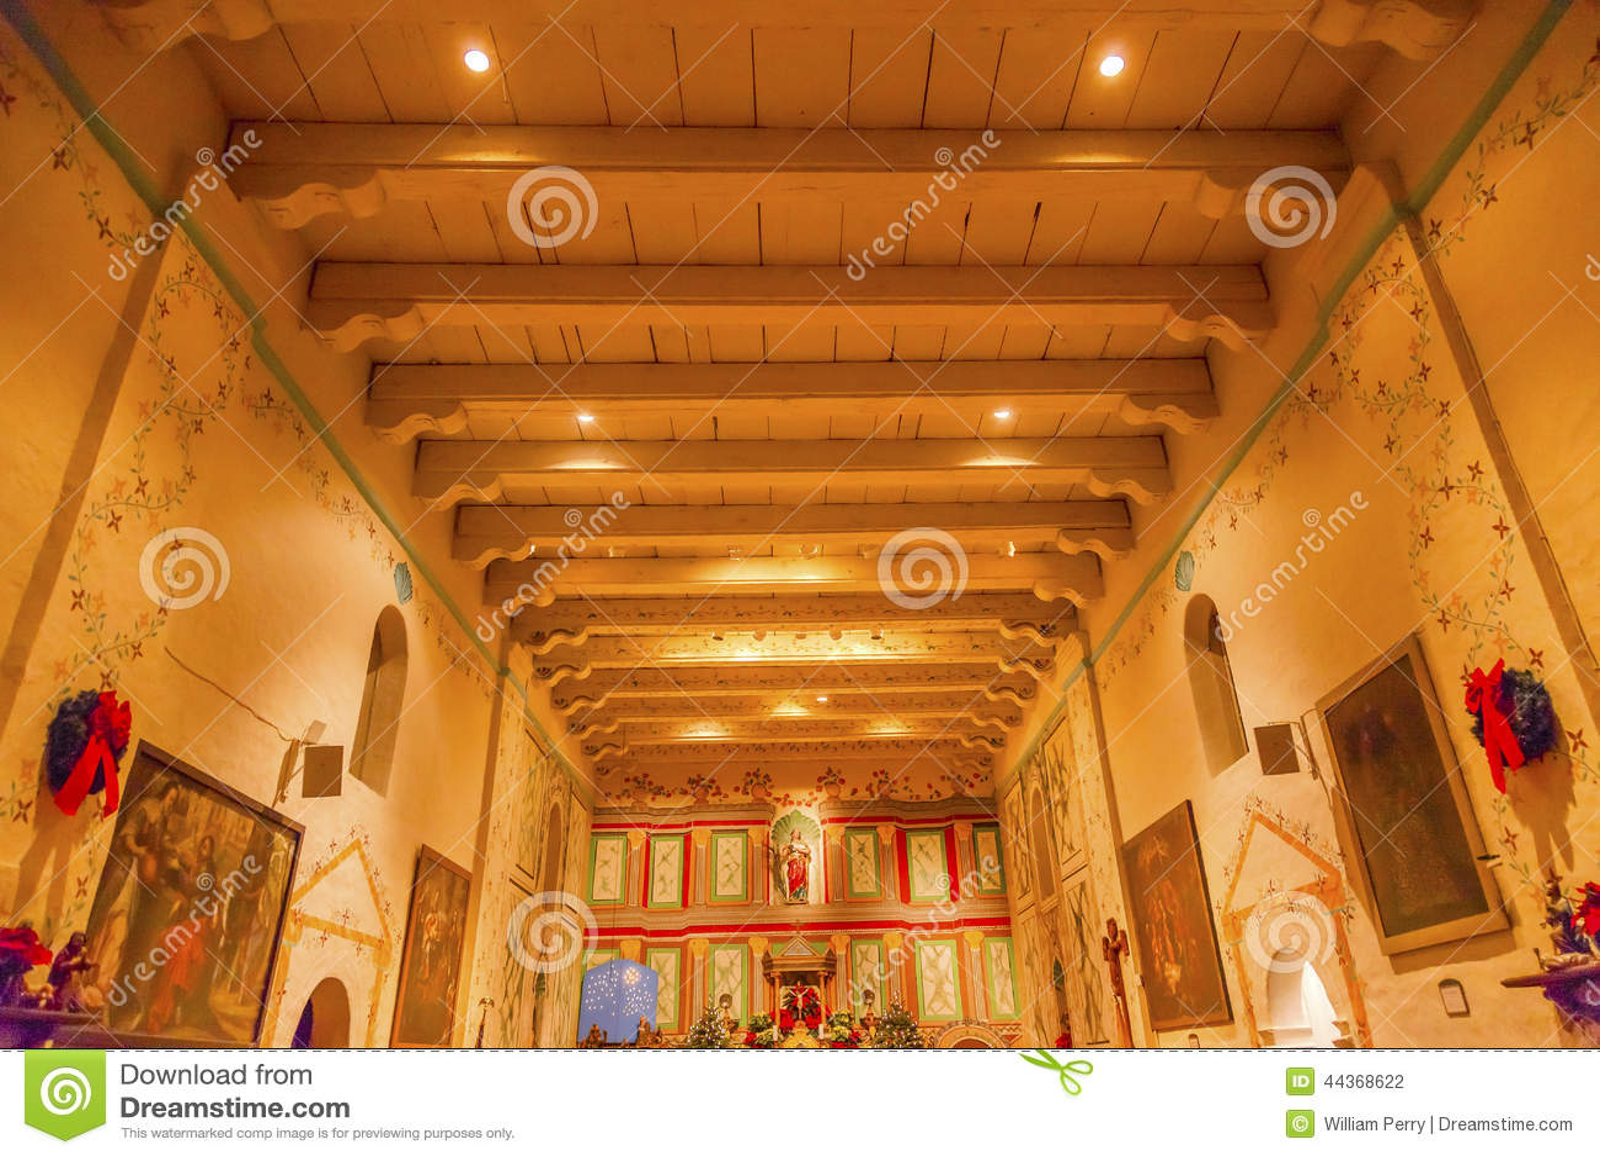 Download Old Mission Santa Ines Solvang California Basilica Altar Cross Stock Photo - Image of basilica, cross: 44368622